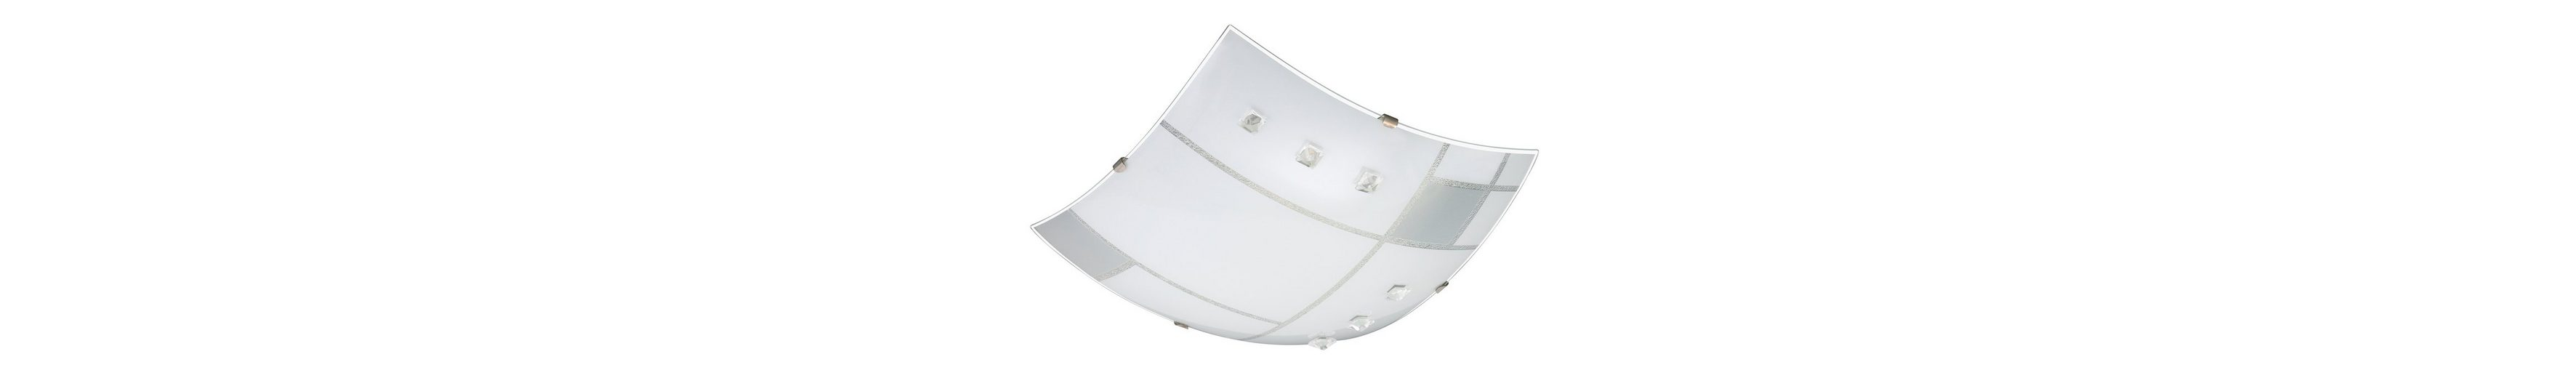 LED Deckenleuchte »Carre«, 12W